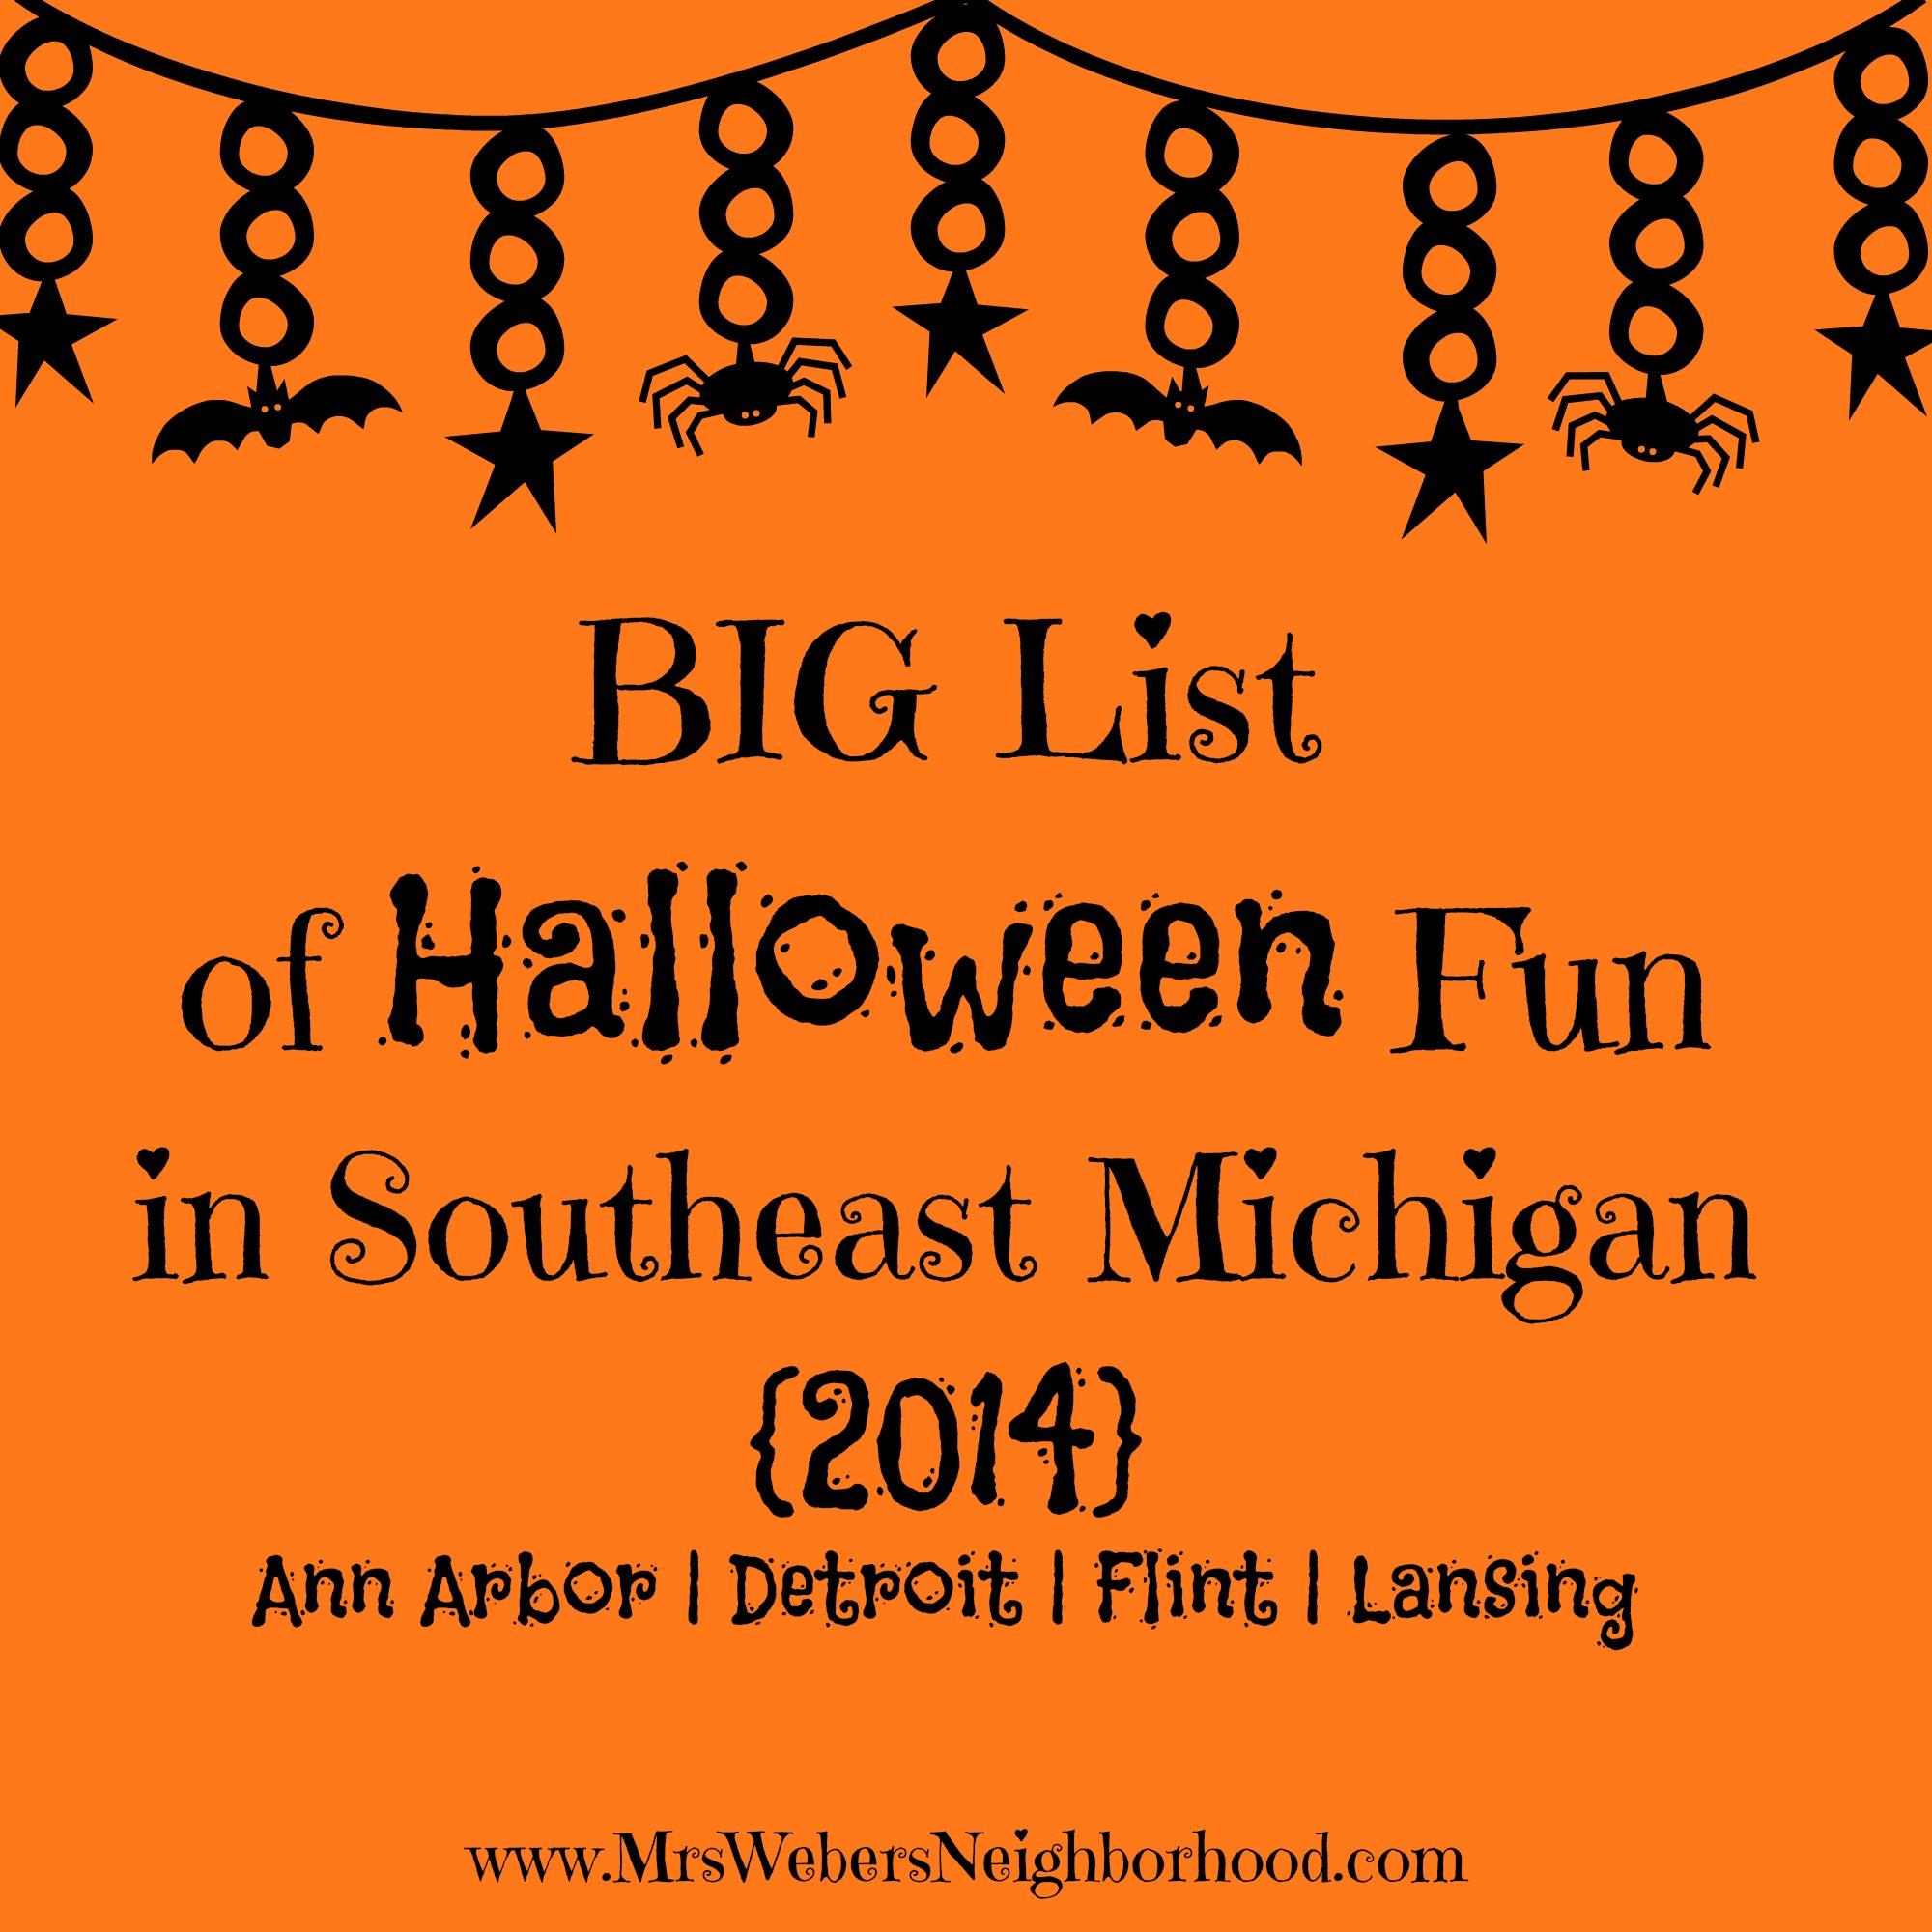 big list of halloween fun in southeast michigan 2014 - mrs. weber's